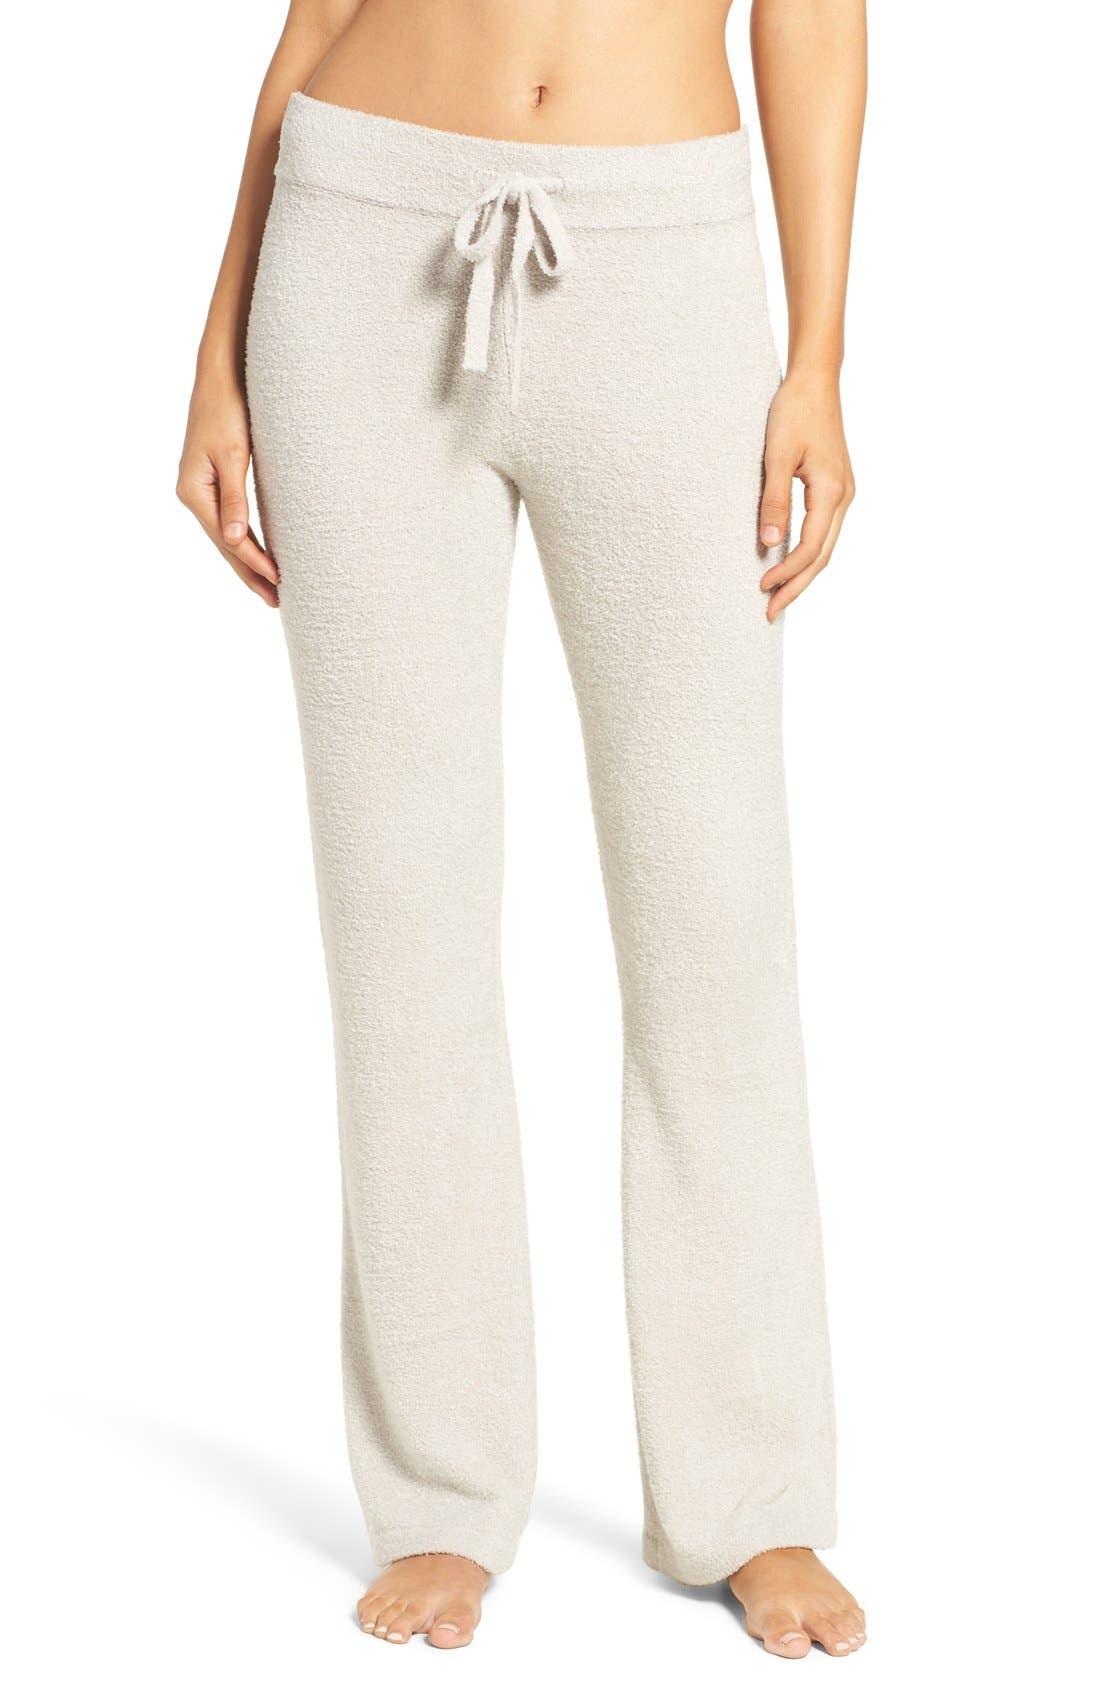 Barefoot Dreams® Cozychic Lite® Lounge Pants